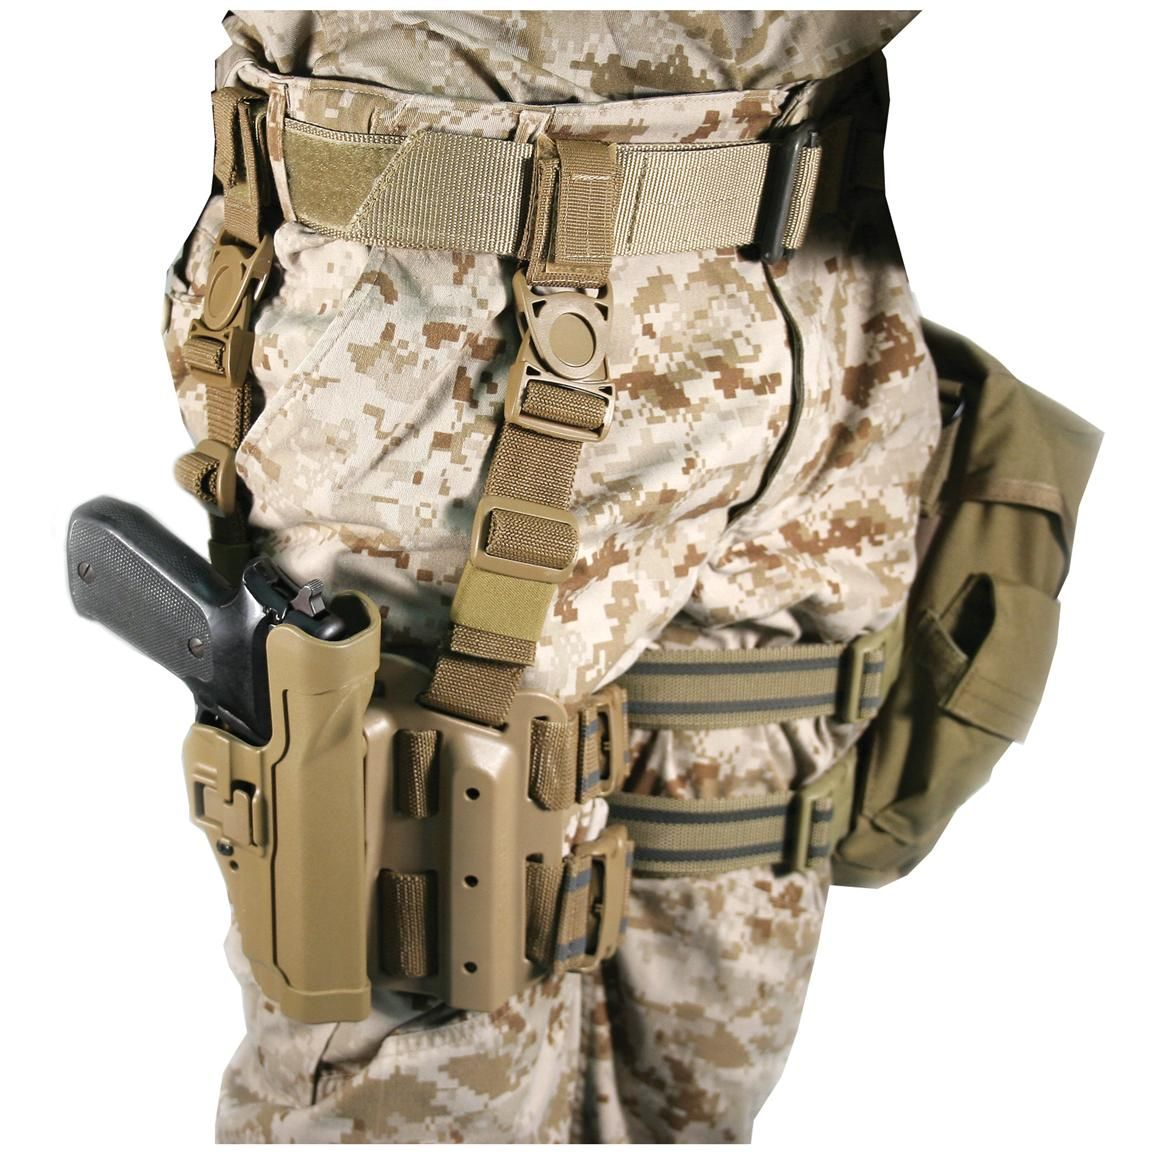 BlackHawk Military Surplus Tactical SERPA Holster   guns